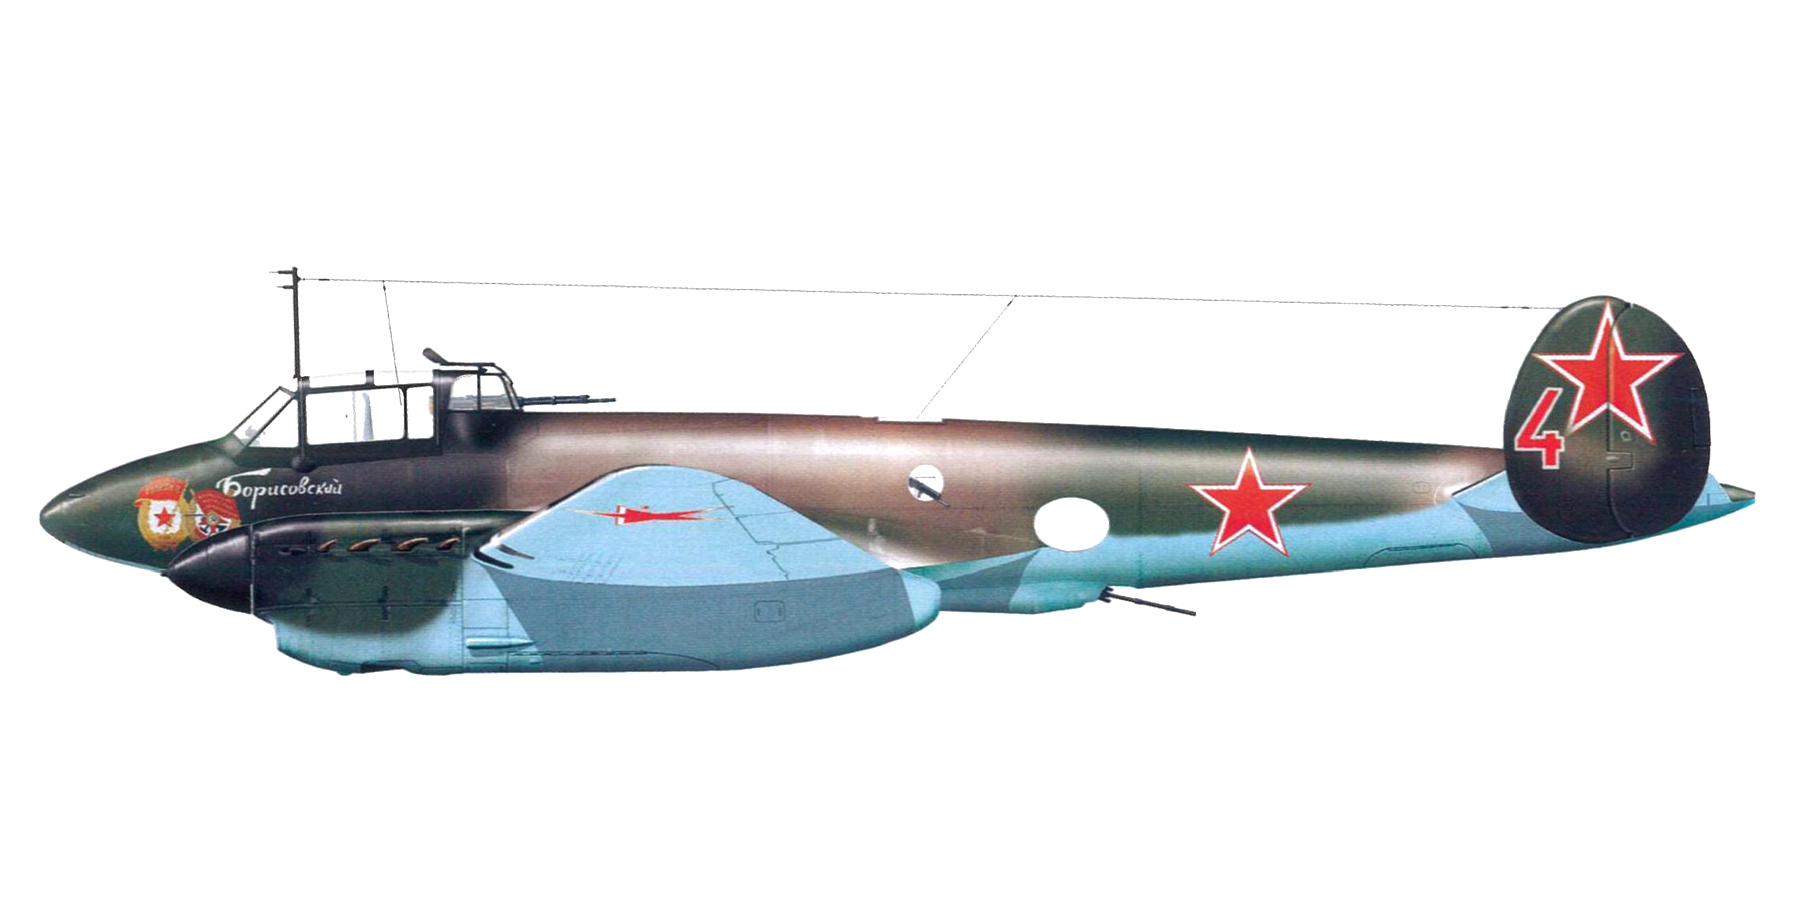 Petlyakov Pe 2 Guards Recon unit 3Sqn Red 4 1944 Flieger Revue extra 30 page 68